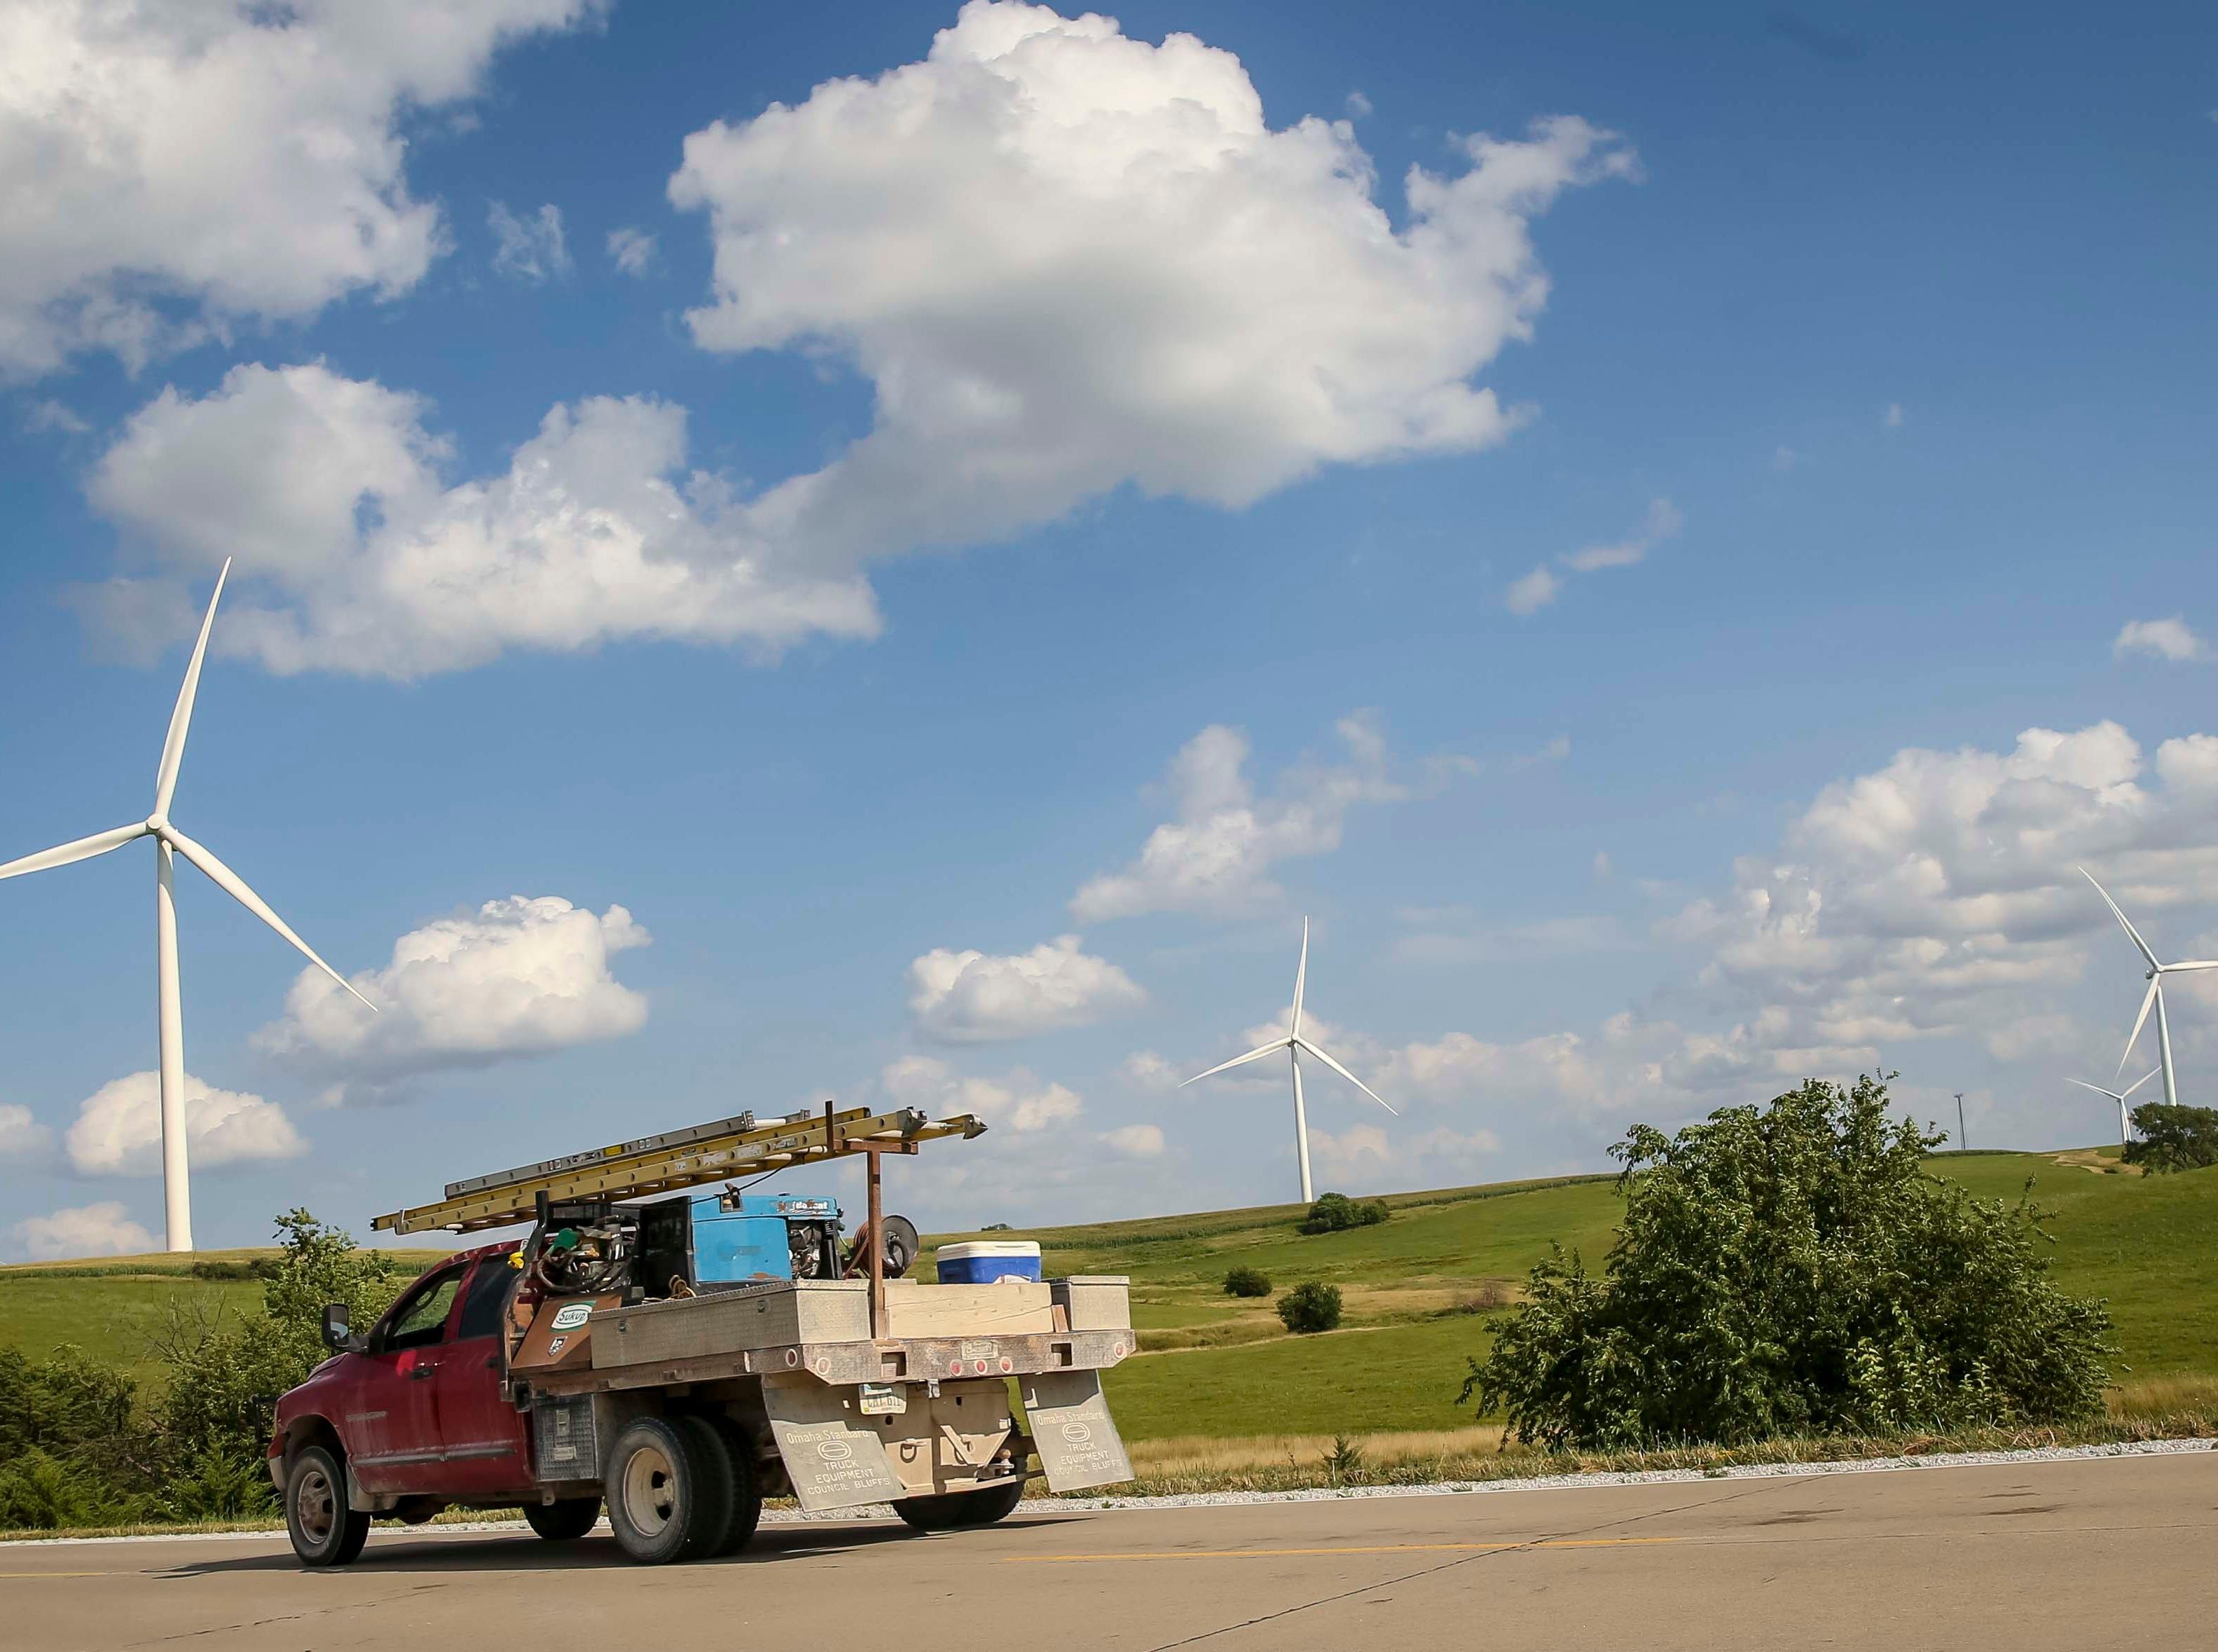 MidAmerican Energy wind turbine farm near Macksburg, Iowa, Friday, July 27, 2018.